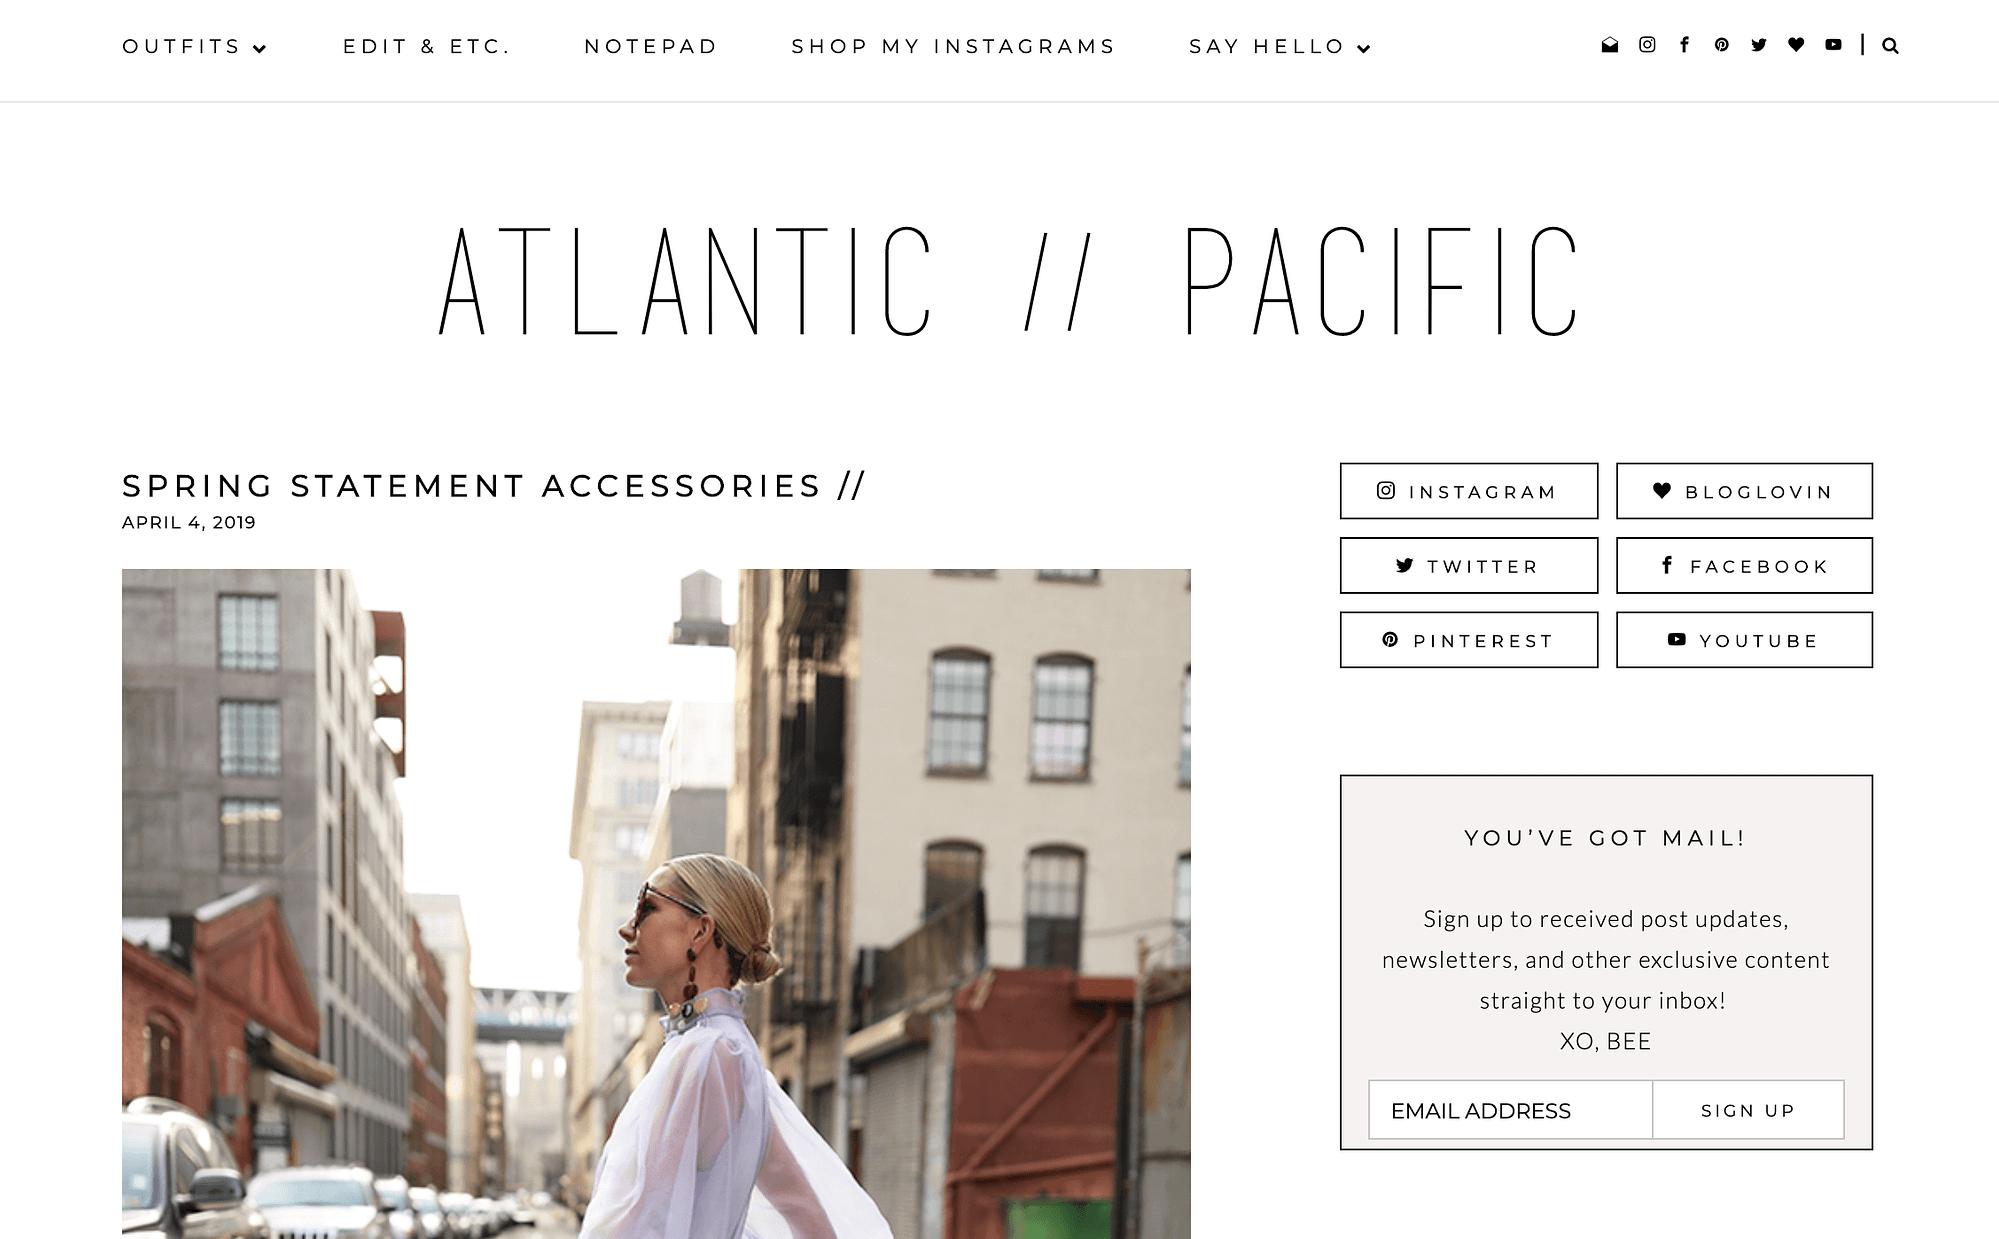 The Atlantic Pacific fashion blog.